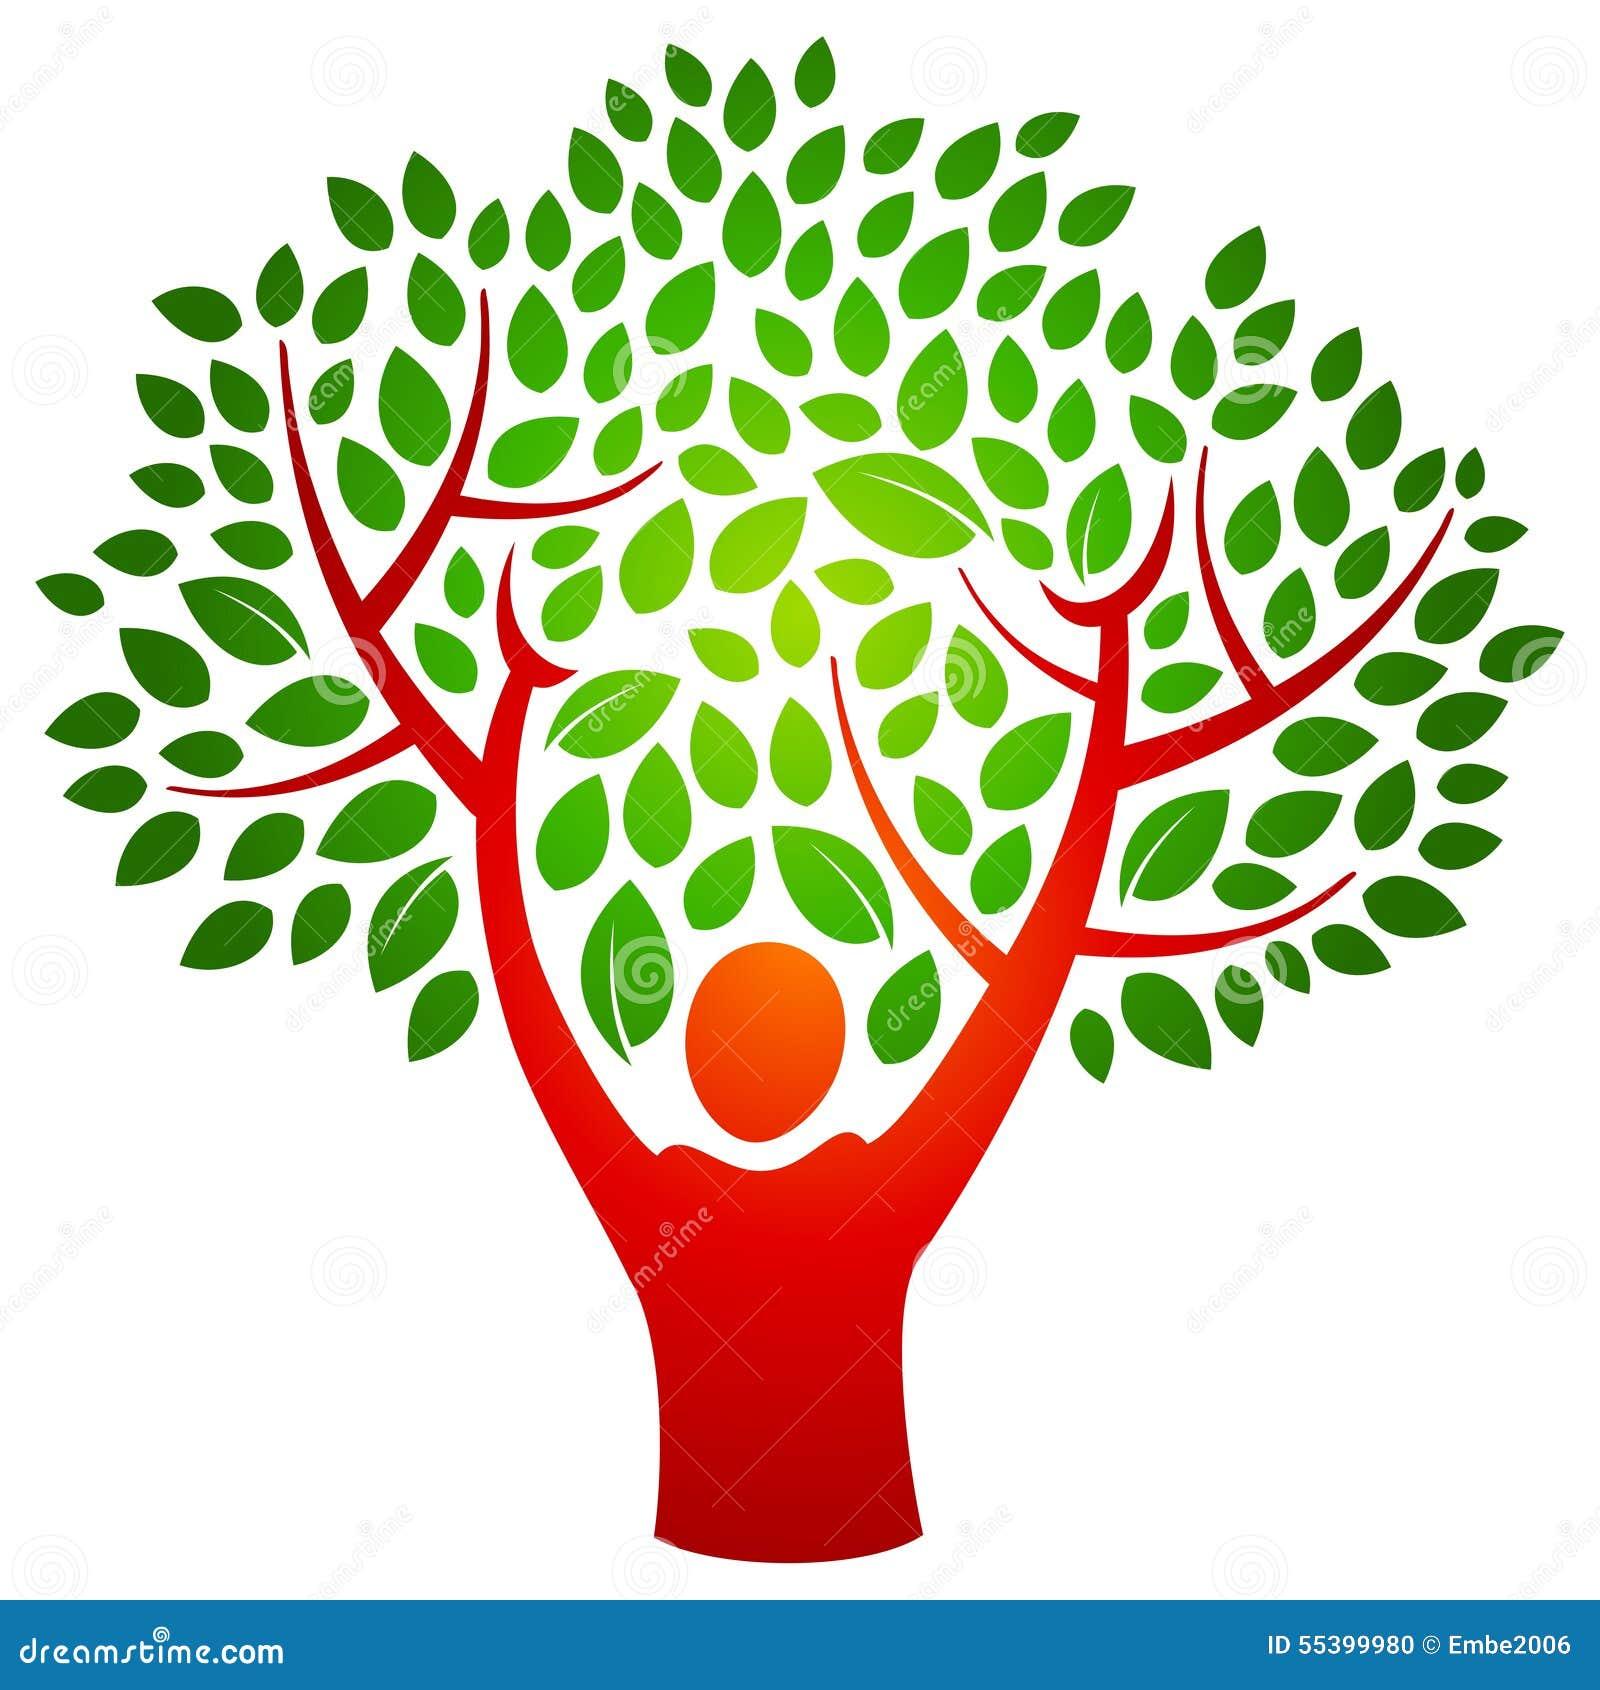 Person tree logo